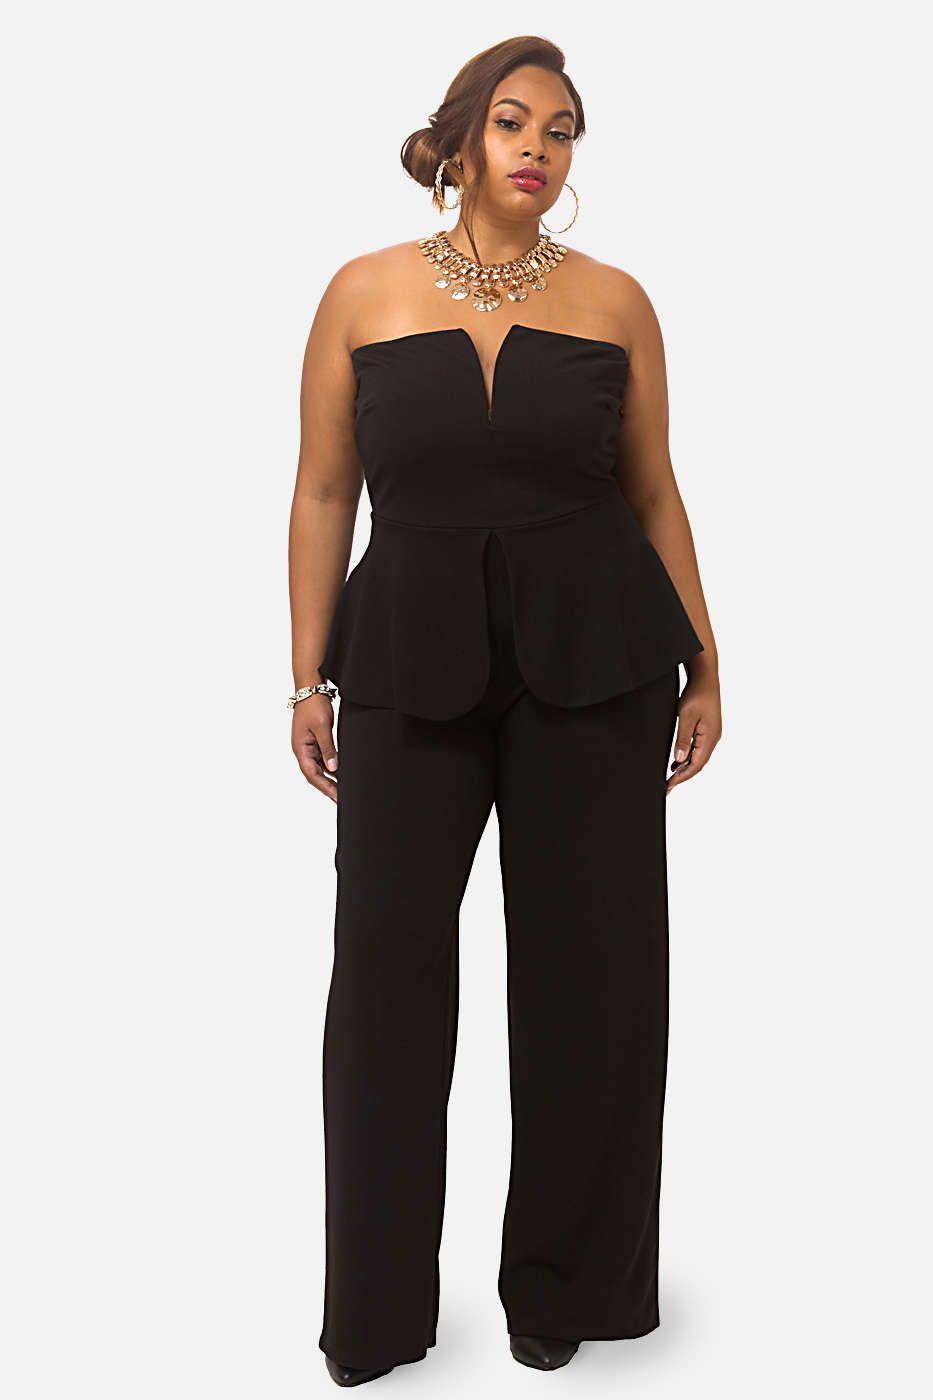 Plus Size Liam Strapless Peplum Jumpsuit Plus Size Outfits Plus Size Jumpsuit Beautiful Jumpsuits